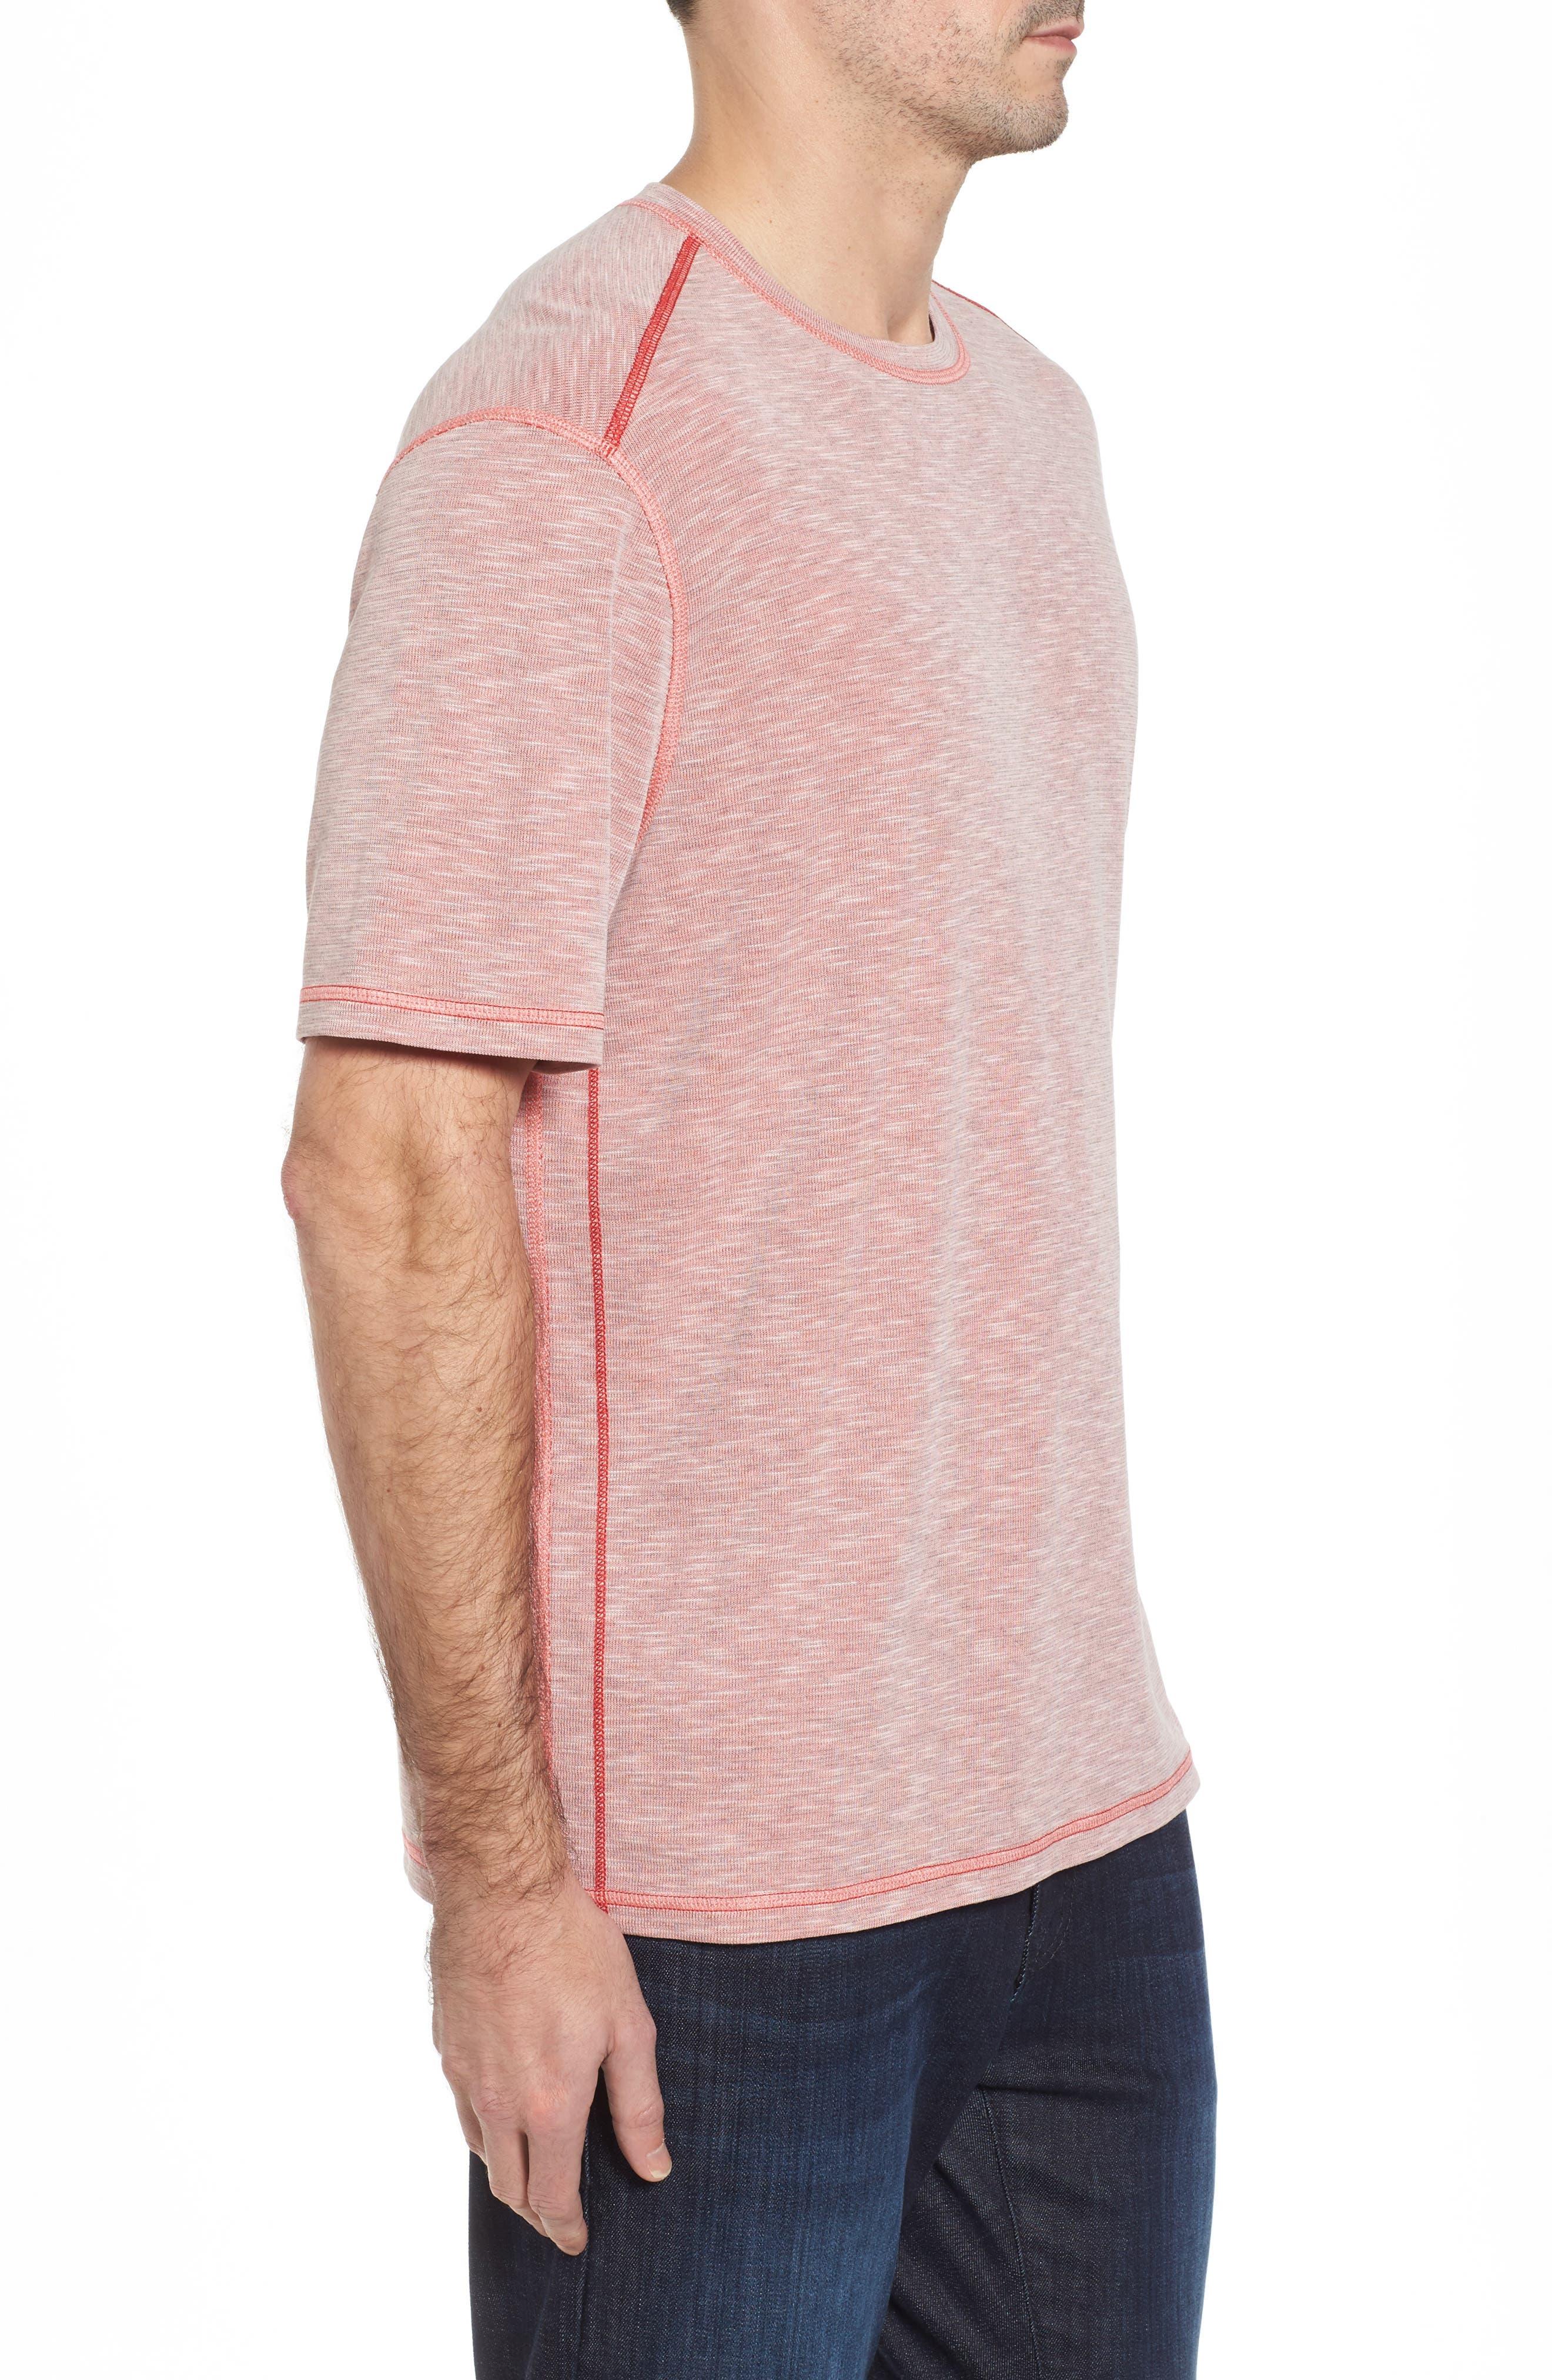 Flip Tide T-Shirt,                             Alternate thumbnail 3, color,                             Red Cherry